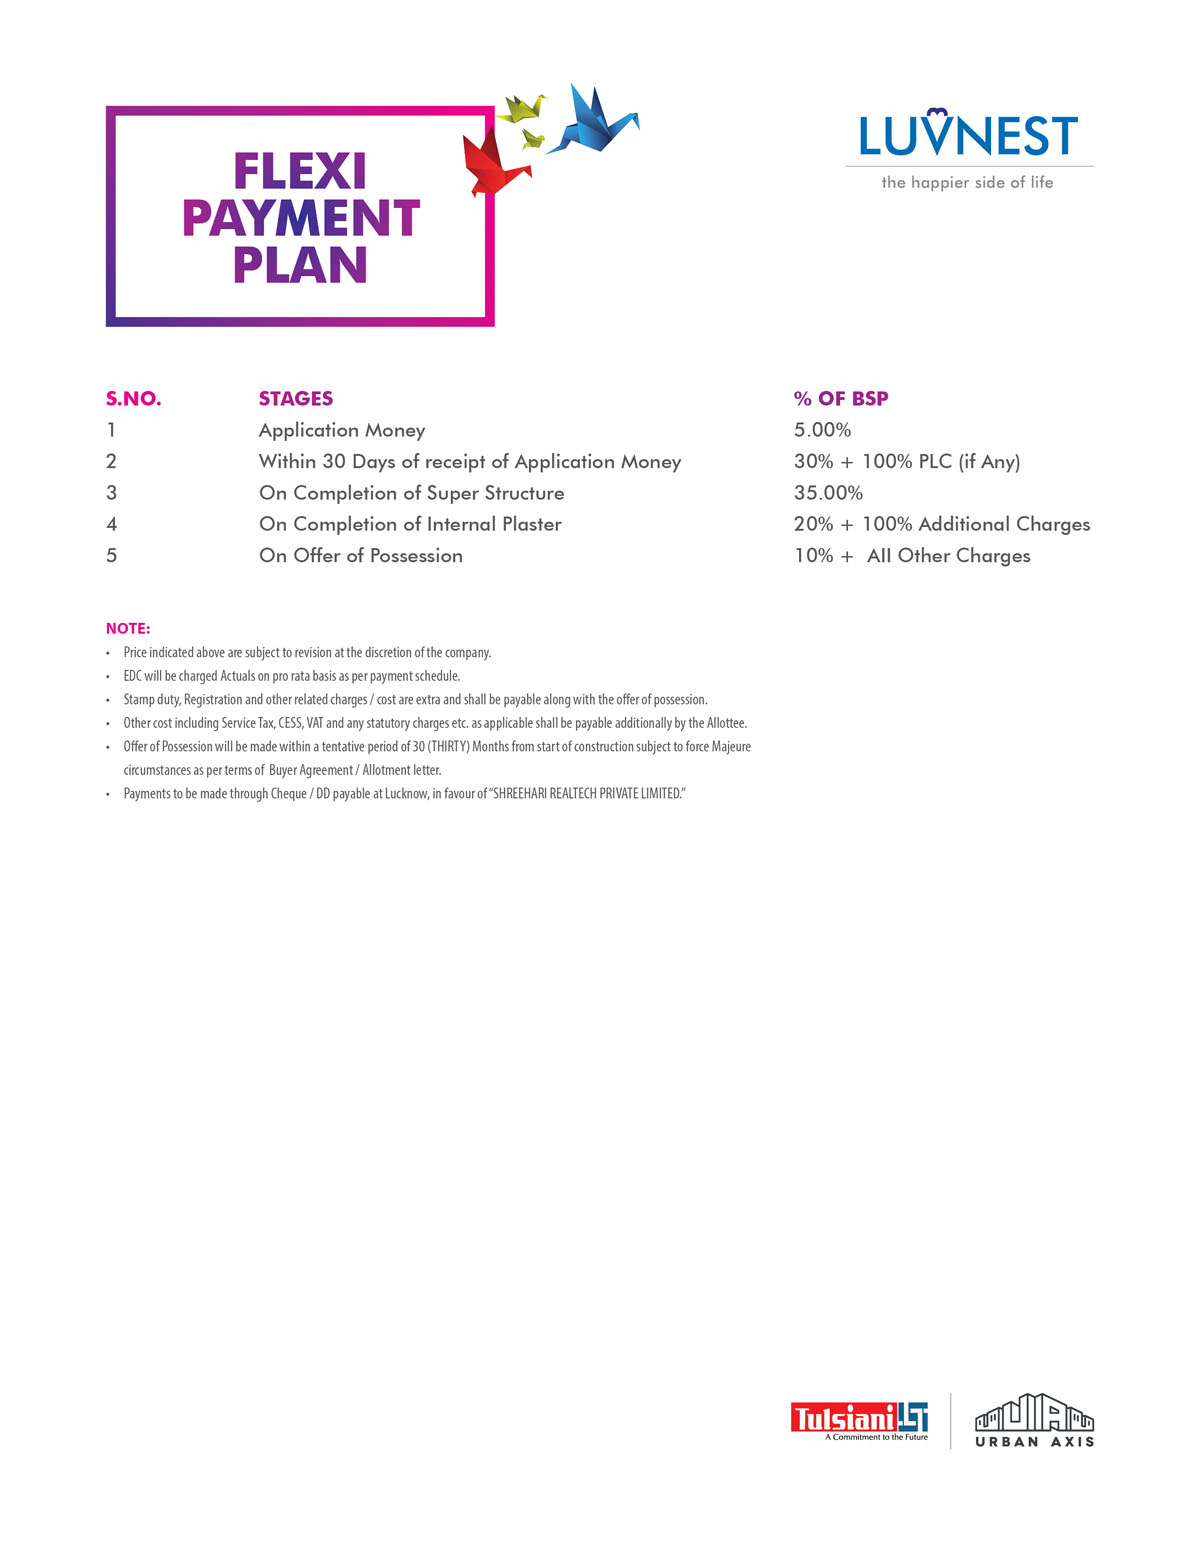 Flexi payment Plan